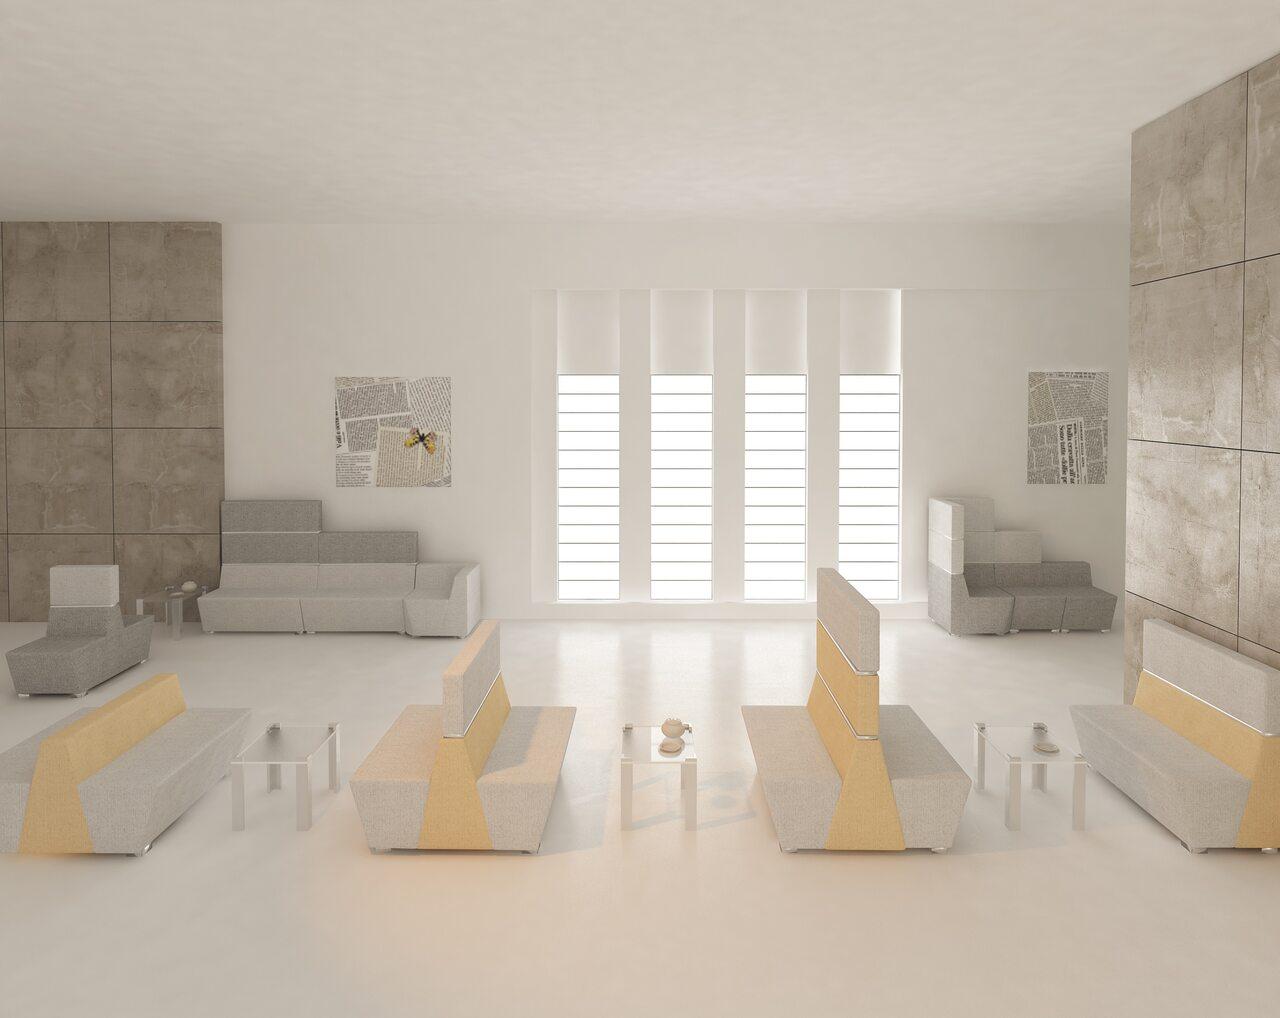 Мягкая офисная мебель М33 Modern feedback - фото 1